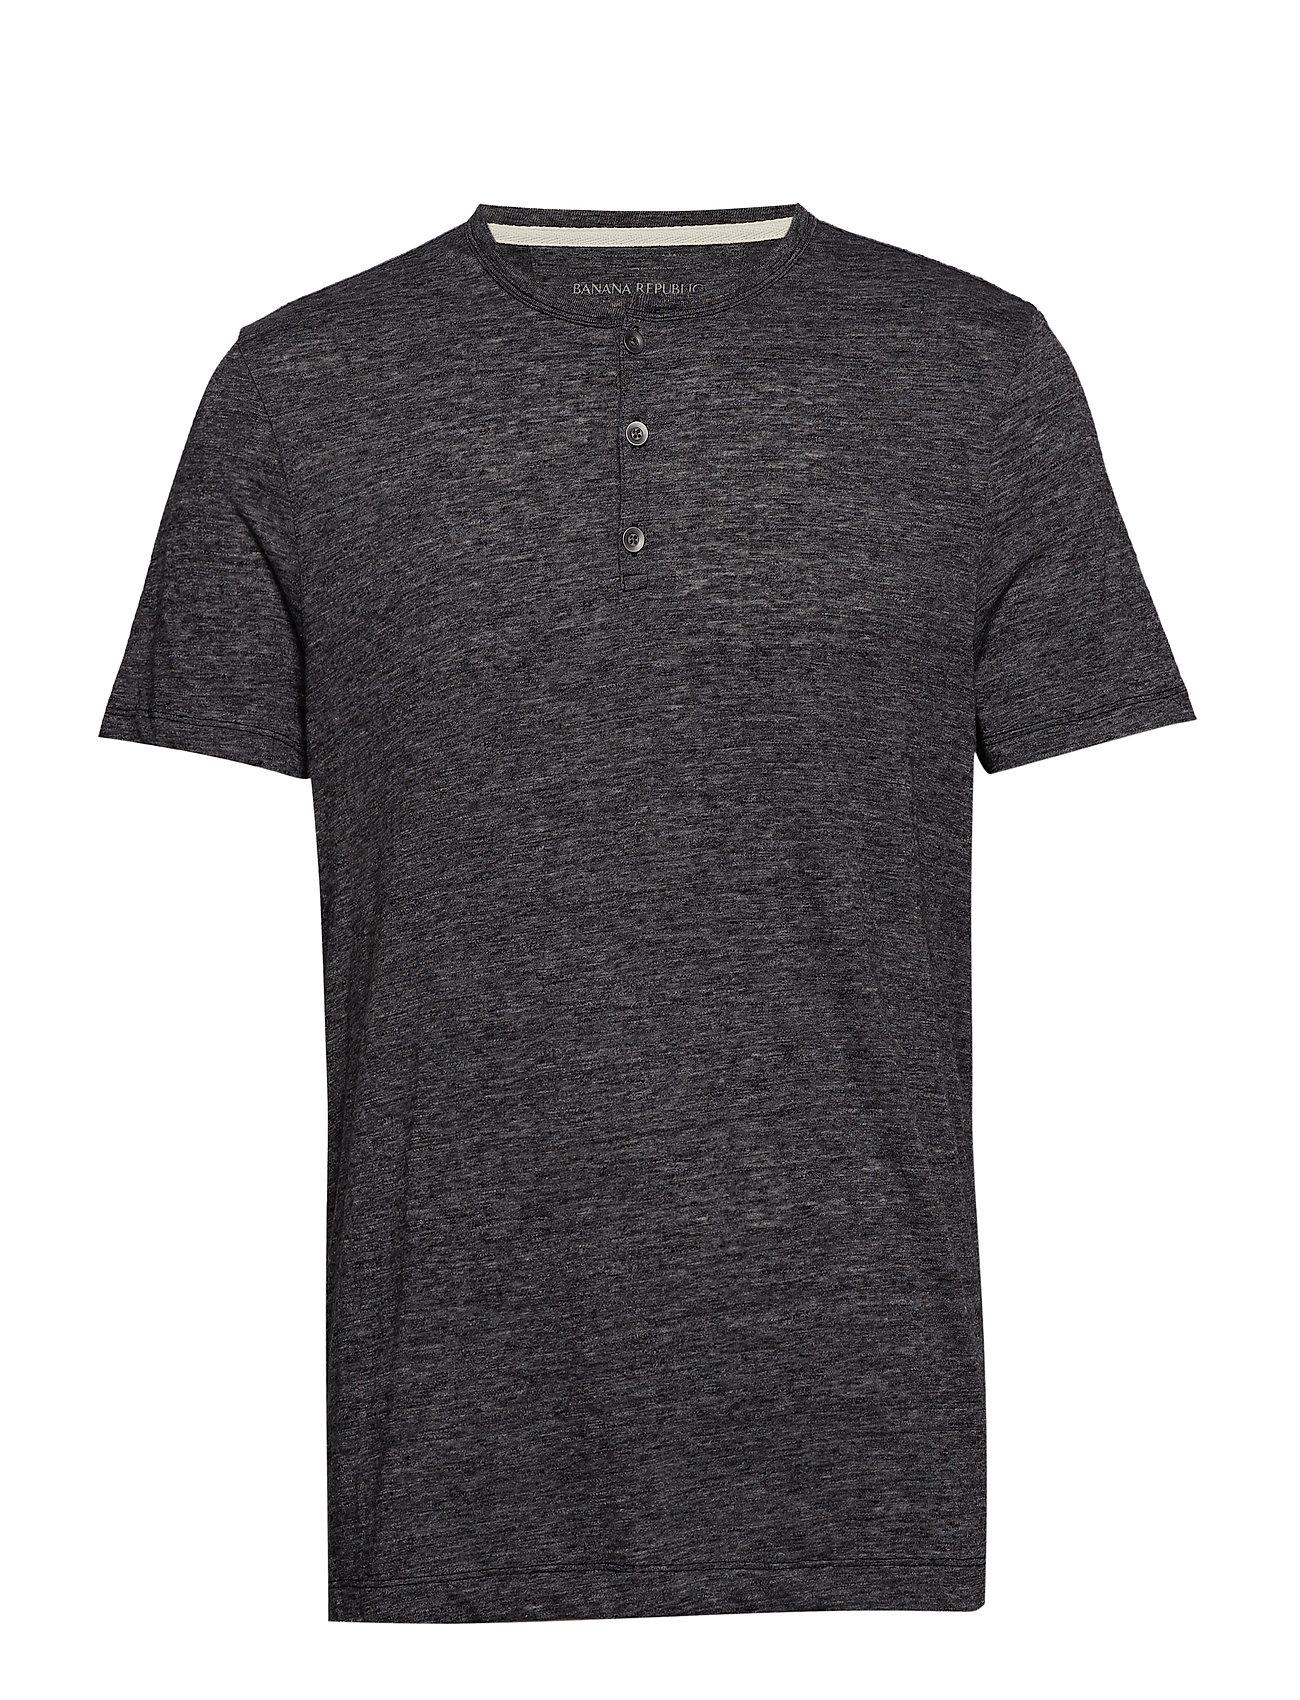 Banana Republic Vintage Henley T-Shirt - BLACK